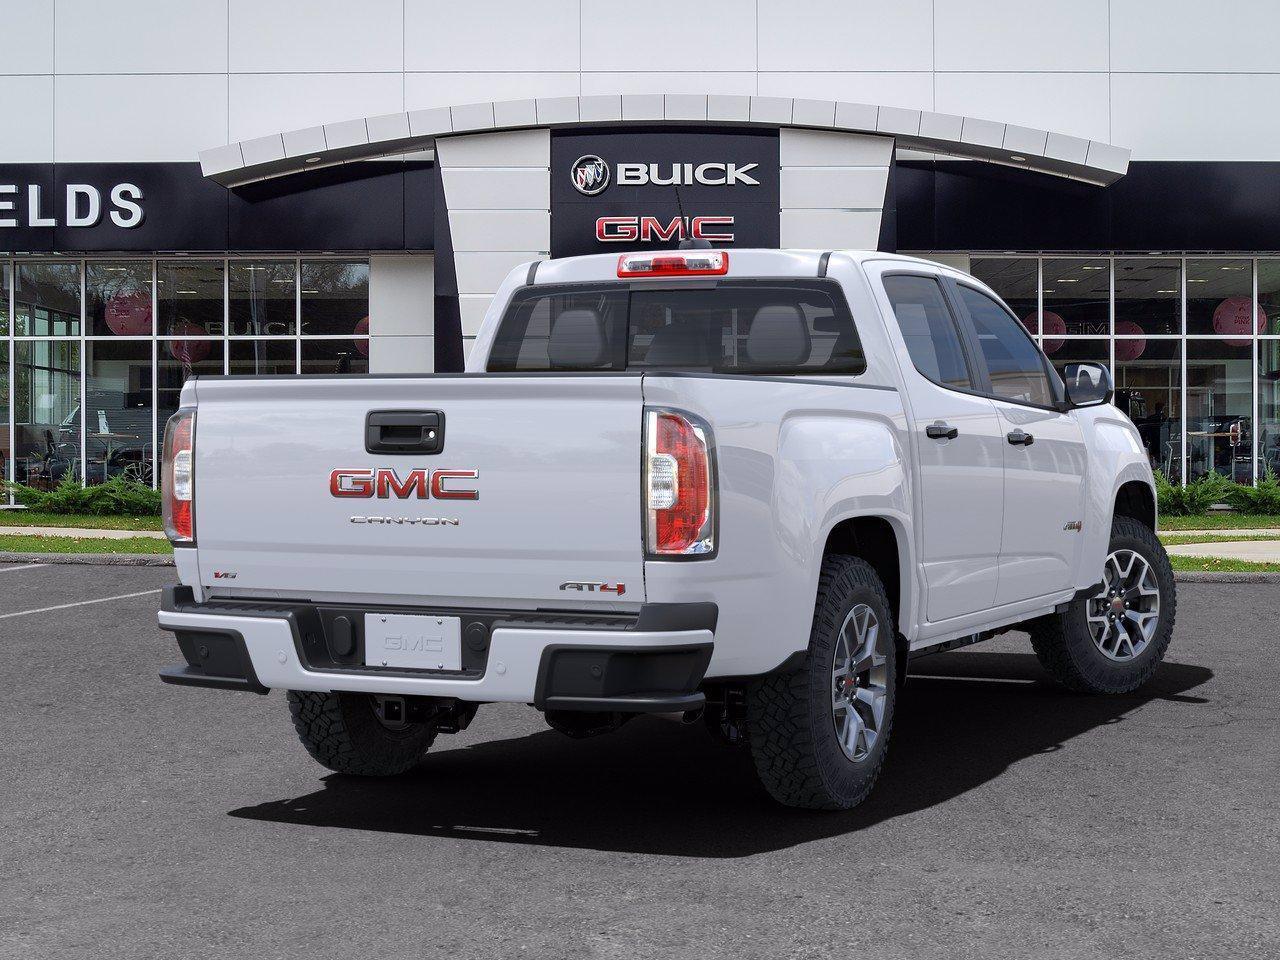 2021 GMC Canyon Crew Cab 4x4, Pickup #G21145 - photo 2